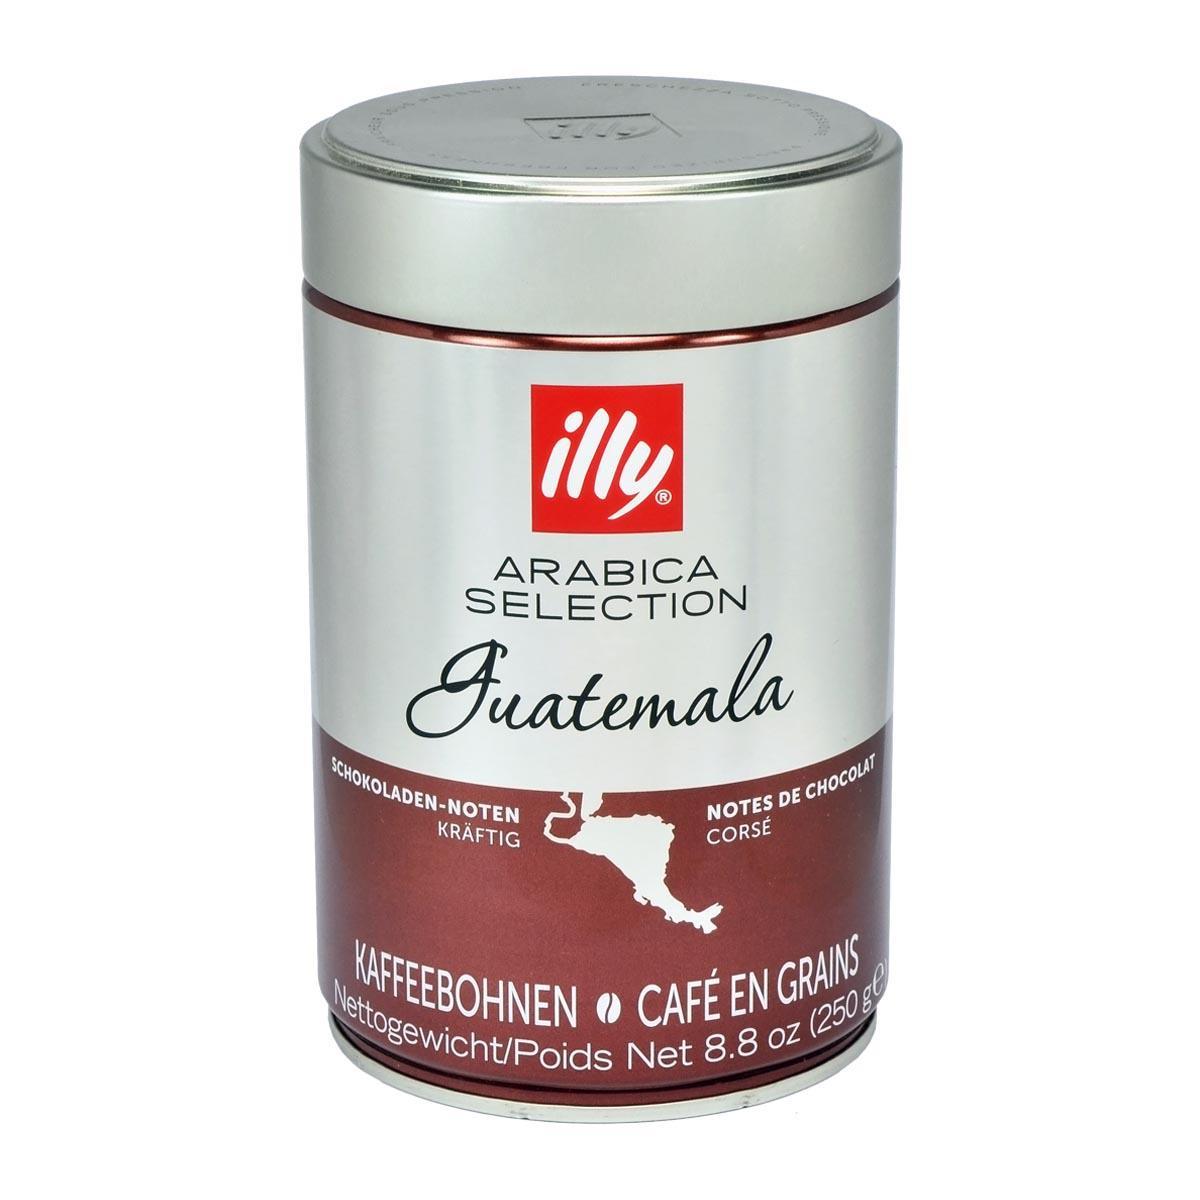 Illy Arabica Selection Guatemala Coffee Beans 250g Tin